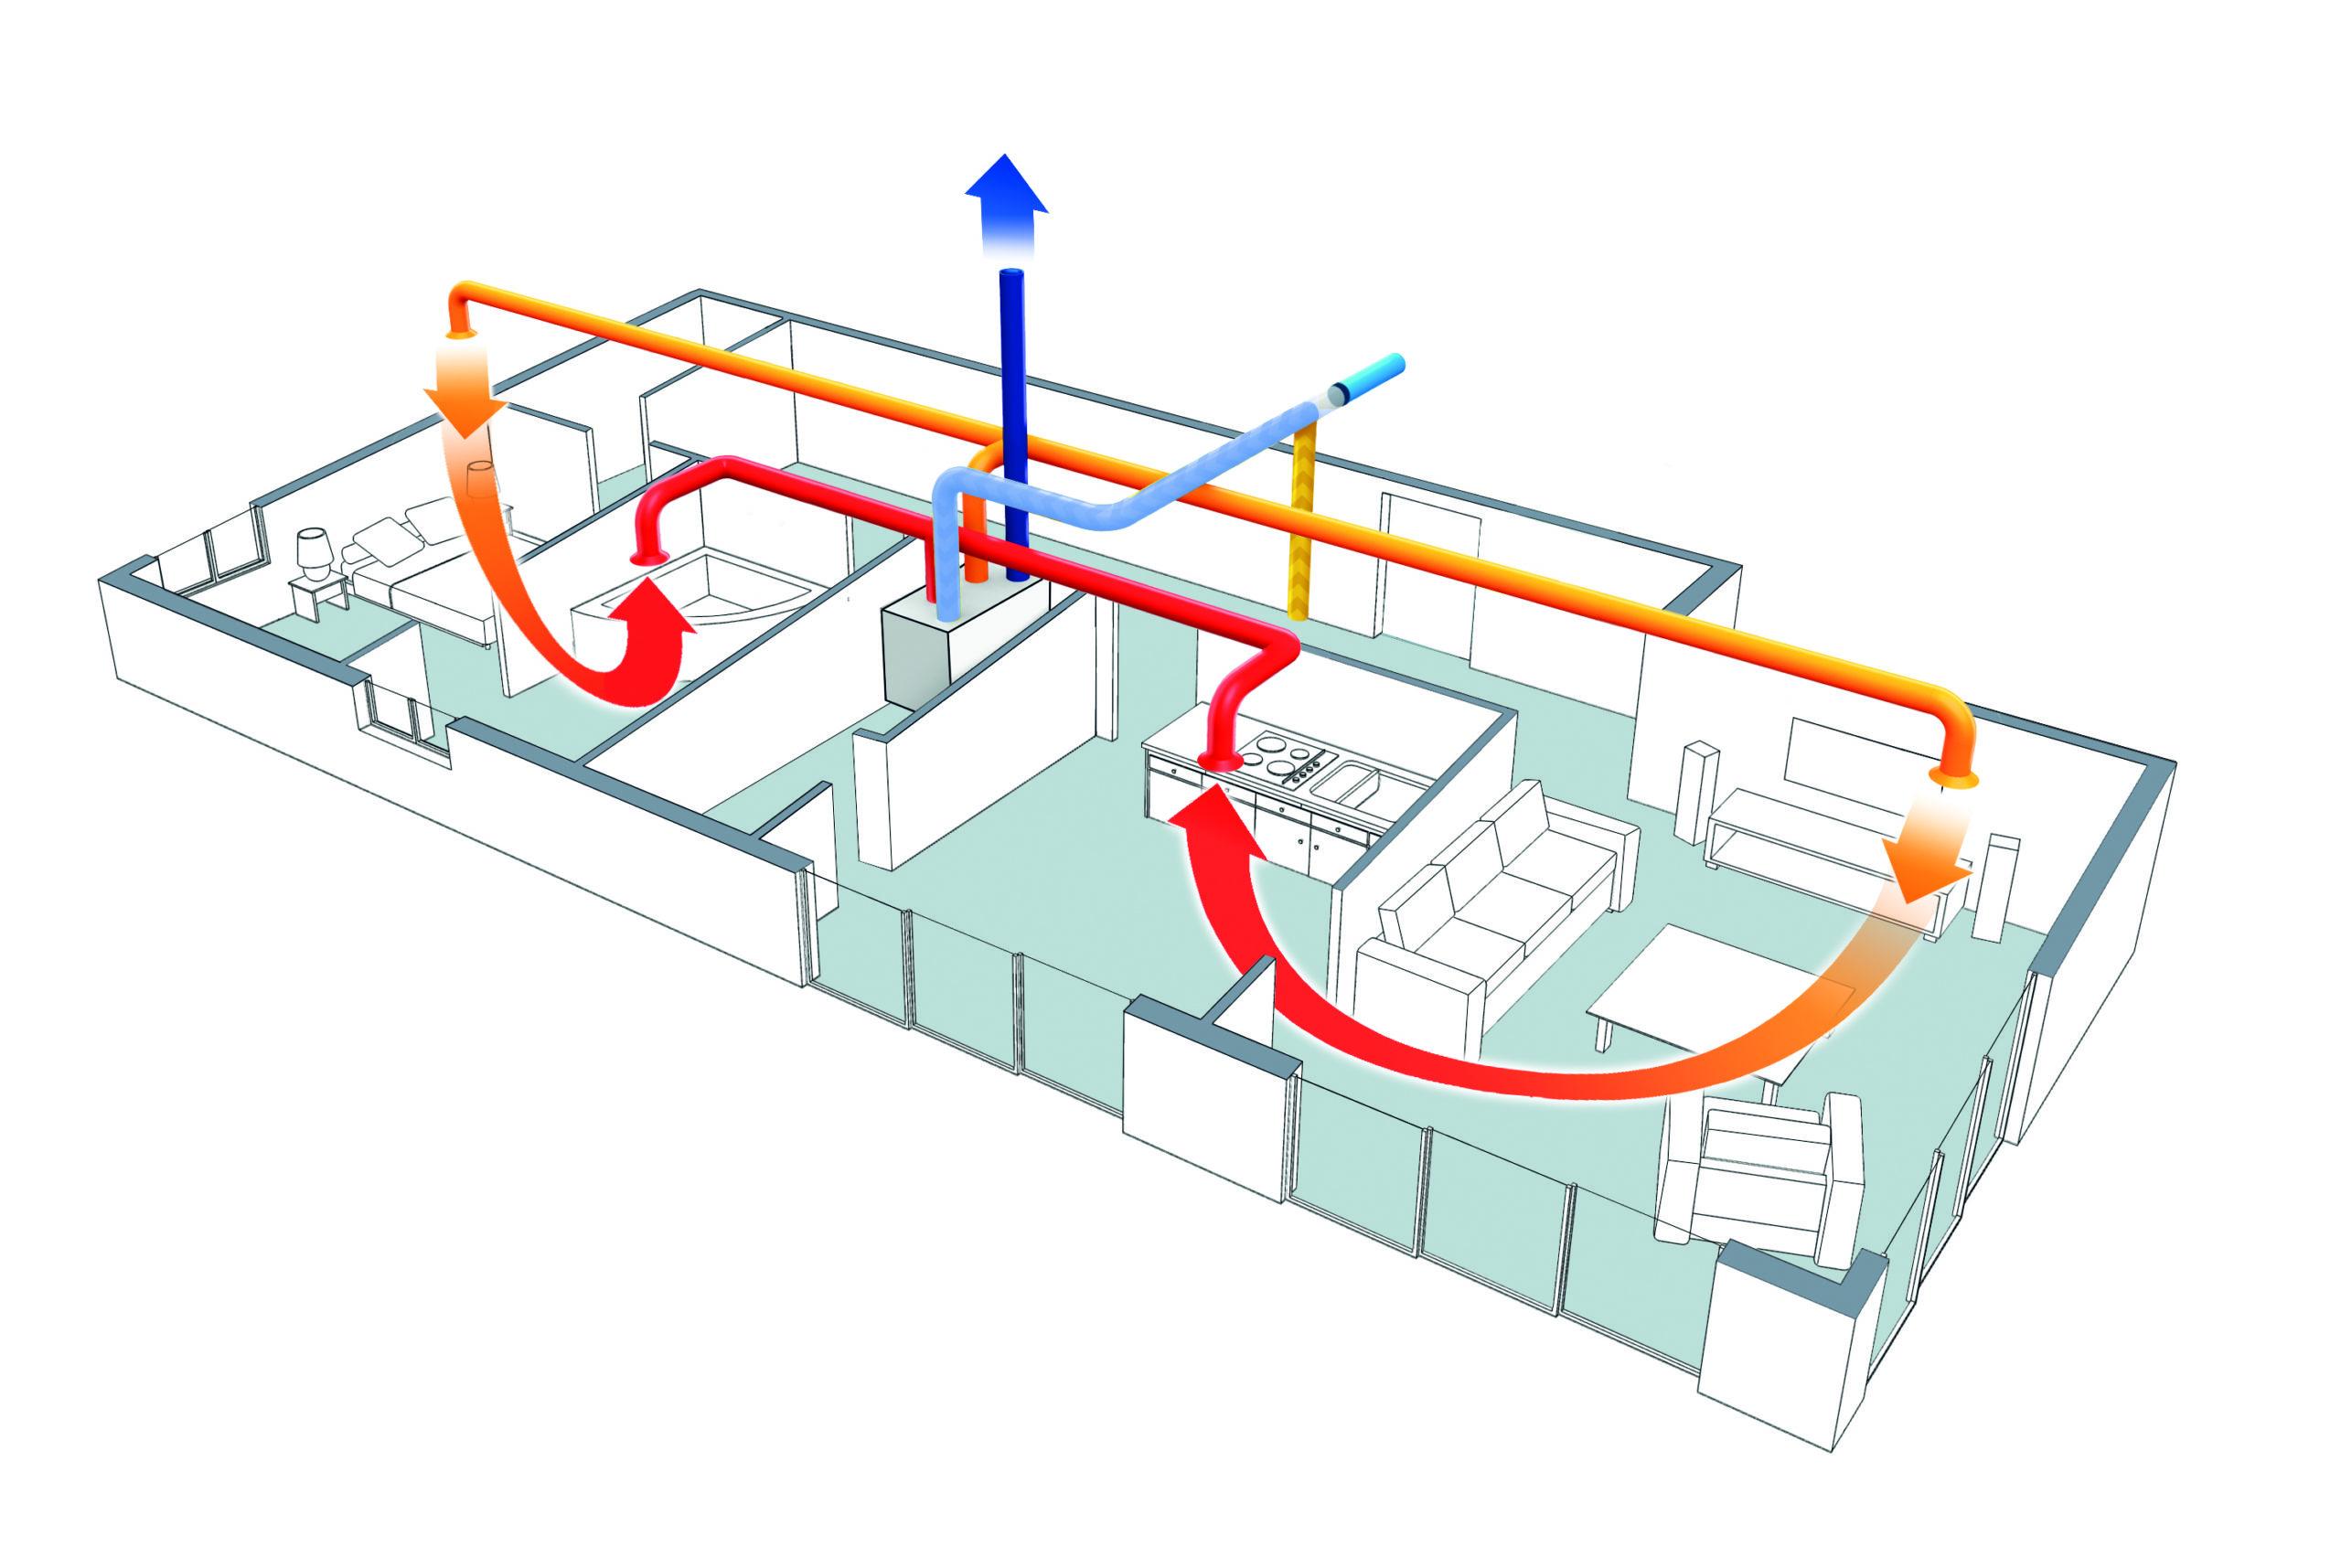 vmc double flux haut rendement atlantic free prix vmc double flux atlantic avec prix vmc double. Black Bedroom Furniture Sets. Home Design Ideas